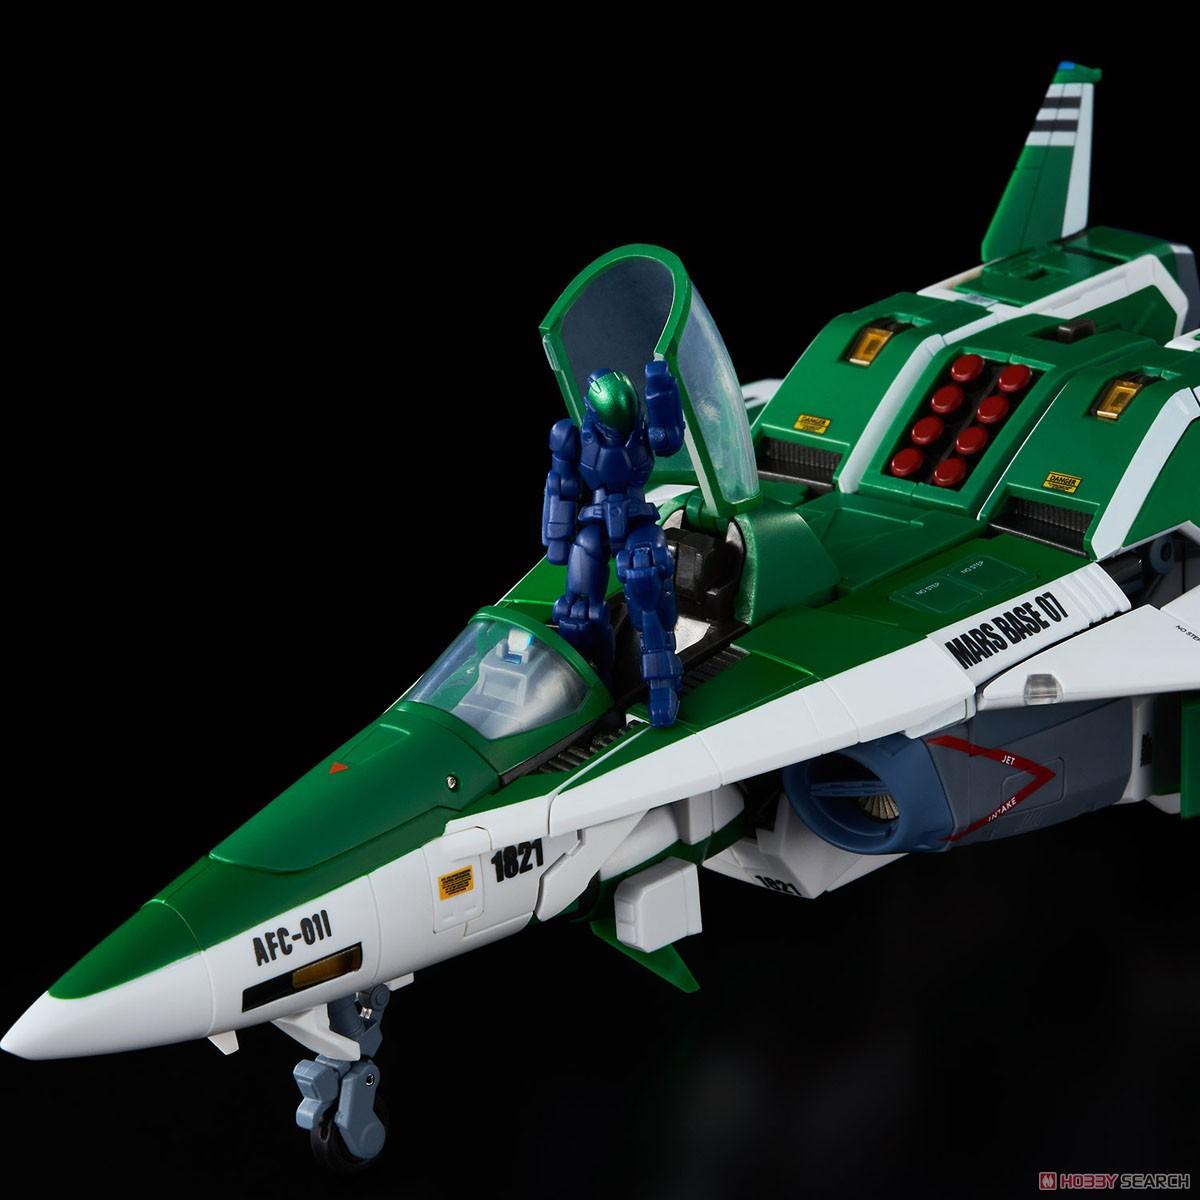 RIOBOT『AFC-01I レギオス・イオタ』機甲創世記モスピーダ 1/48 可変可動フィギュア-015